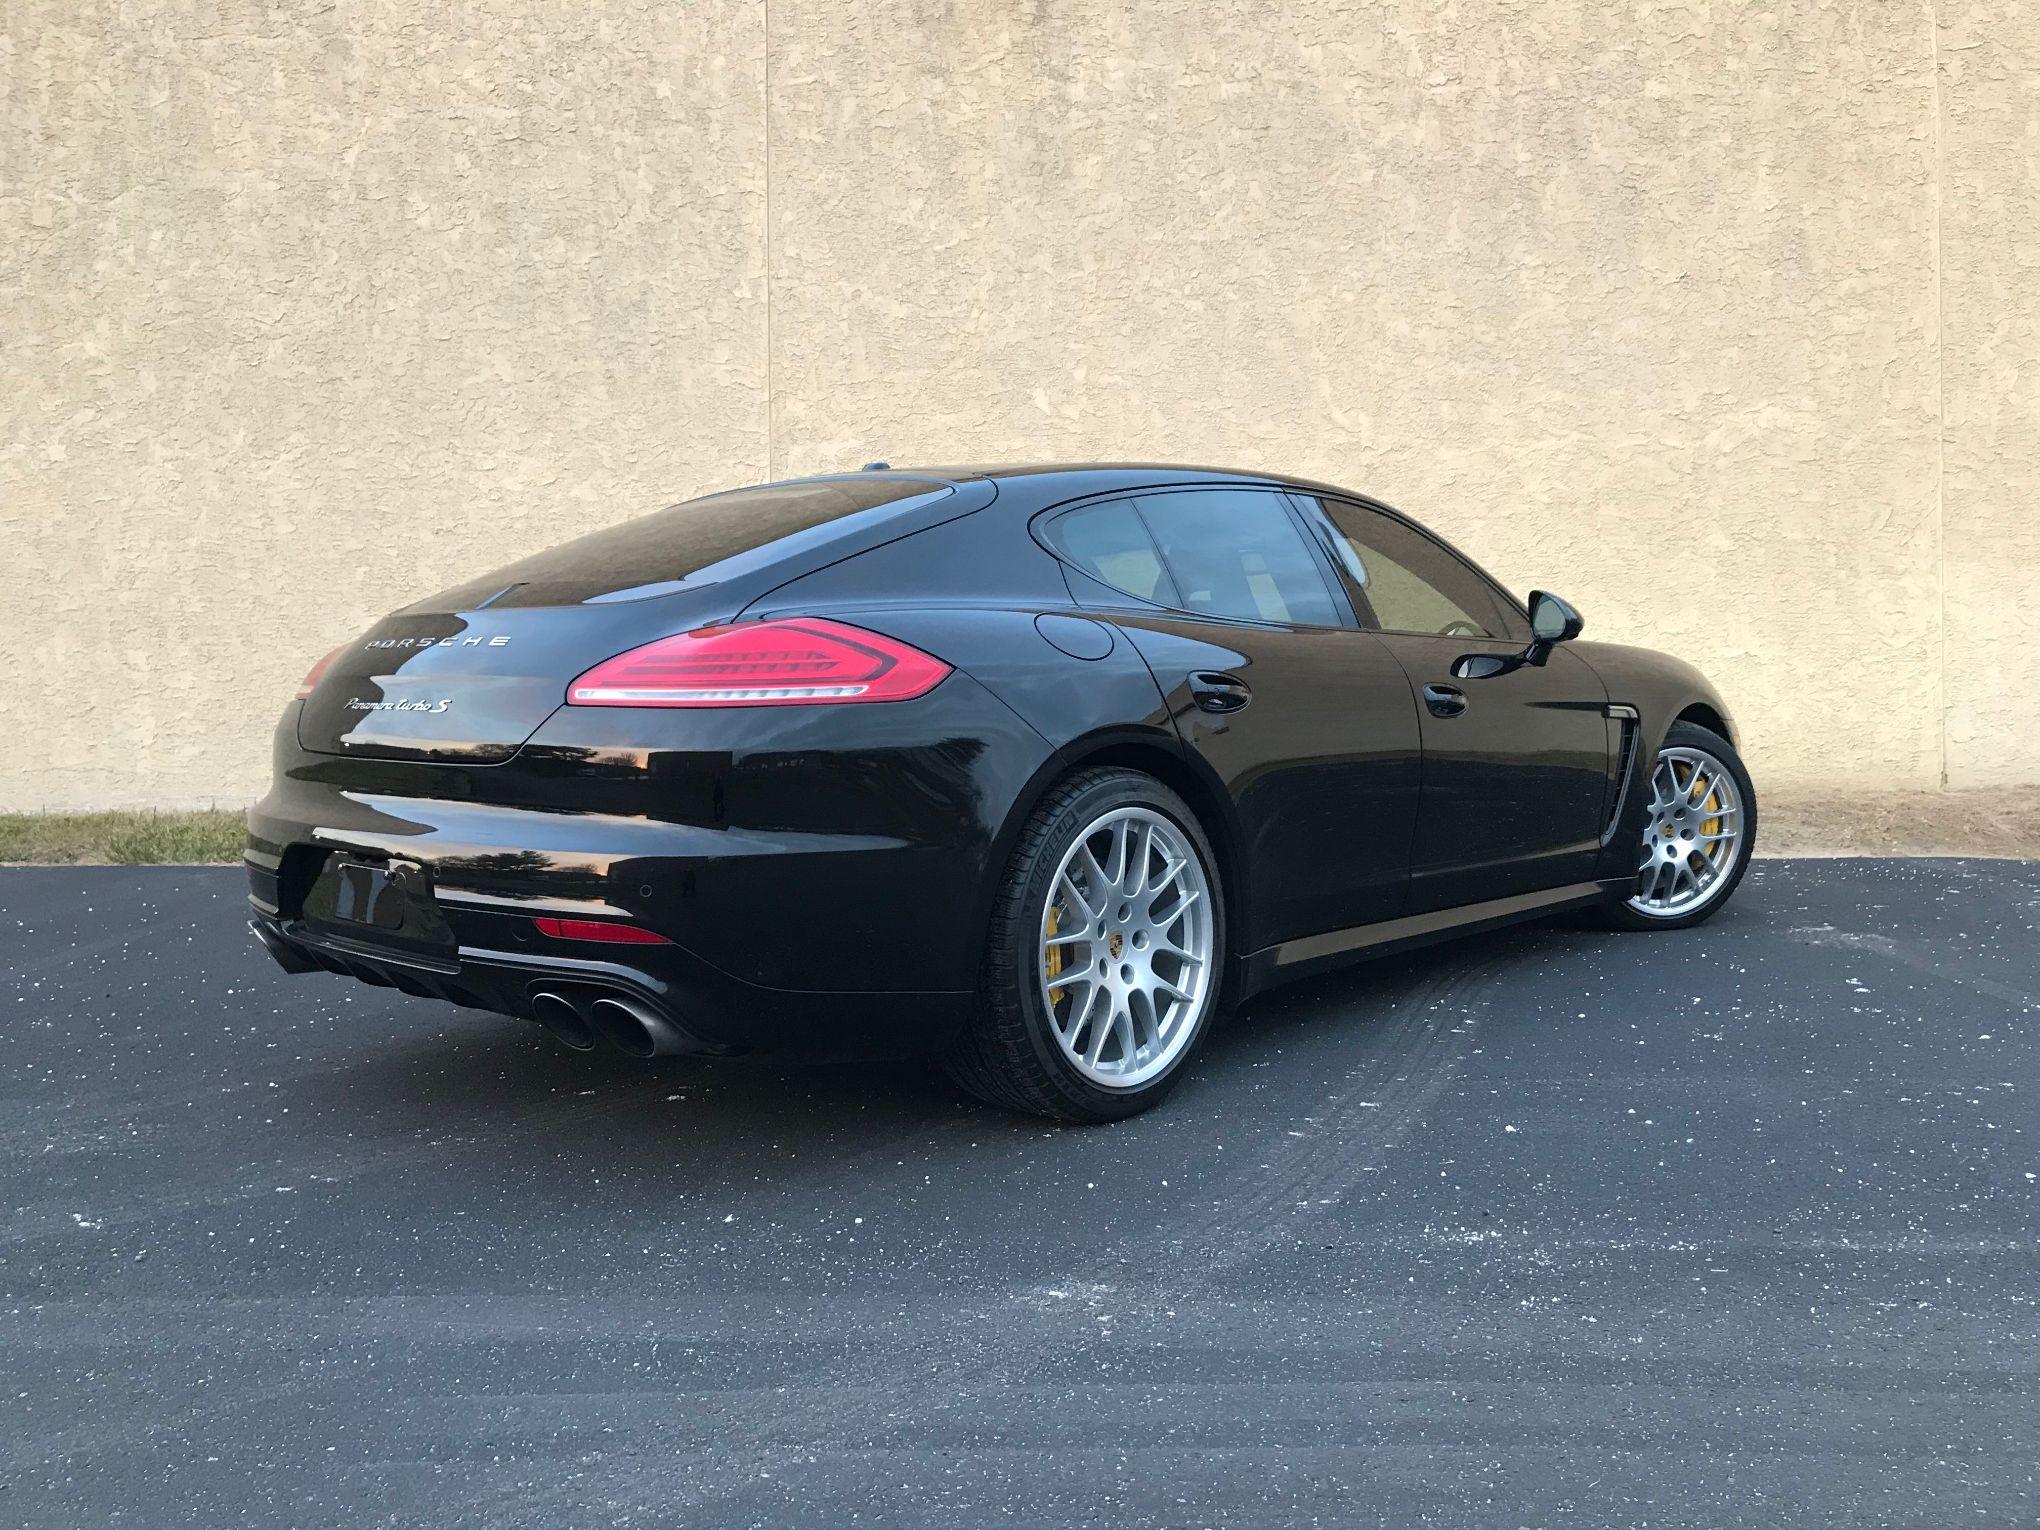 2015 Porsche Panamera Turbo S Pcarmarket